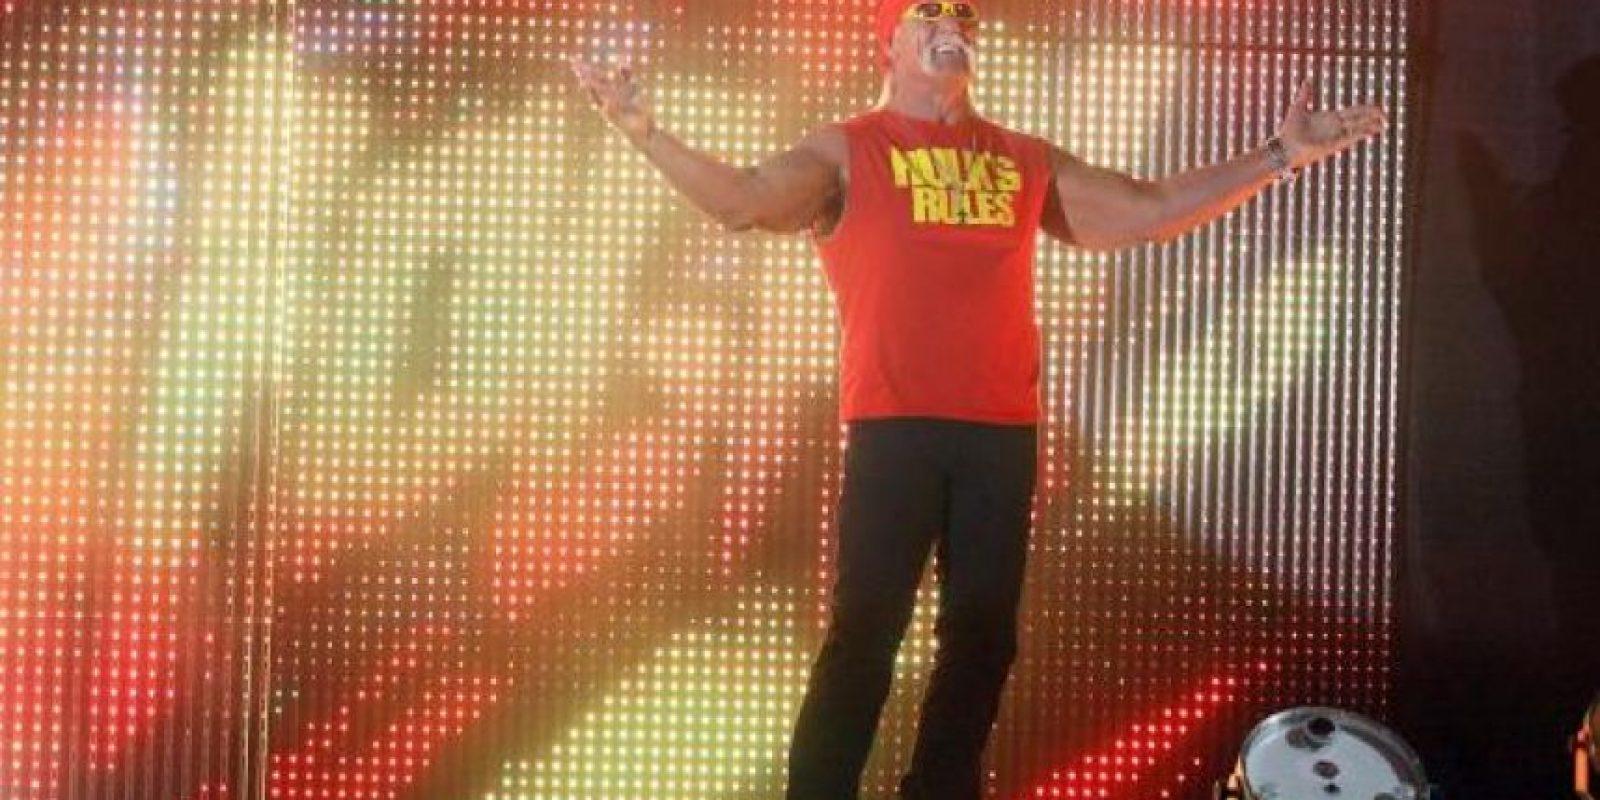 Al lado de Hulk Hogan Foto:WWE